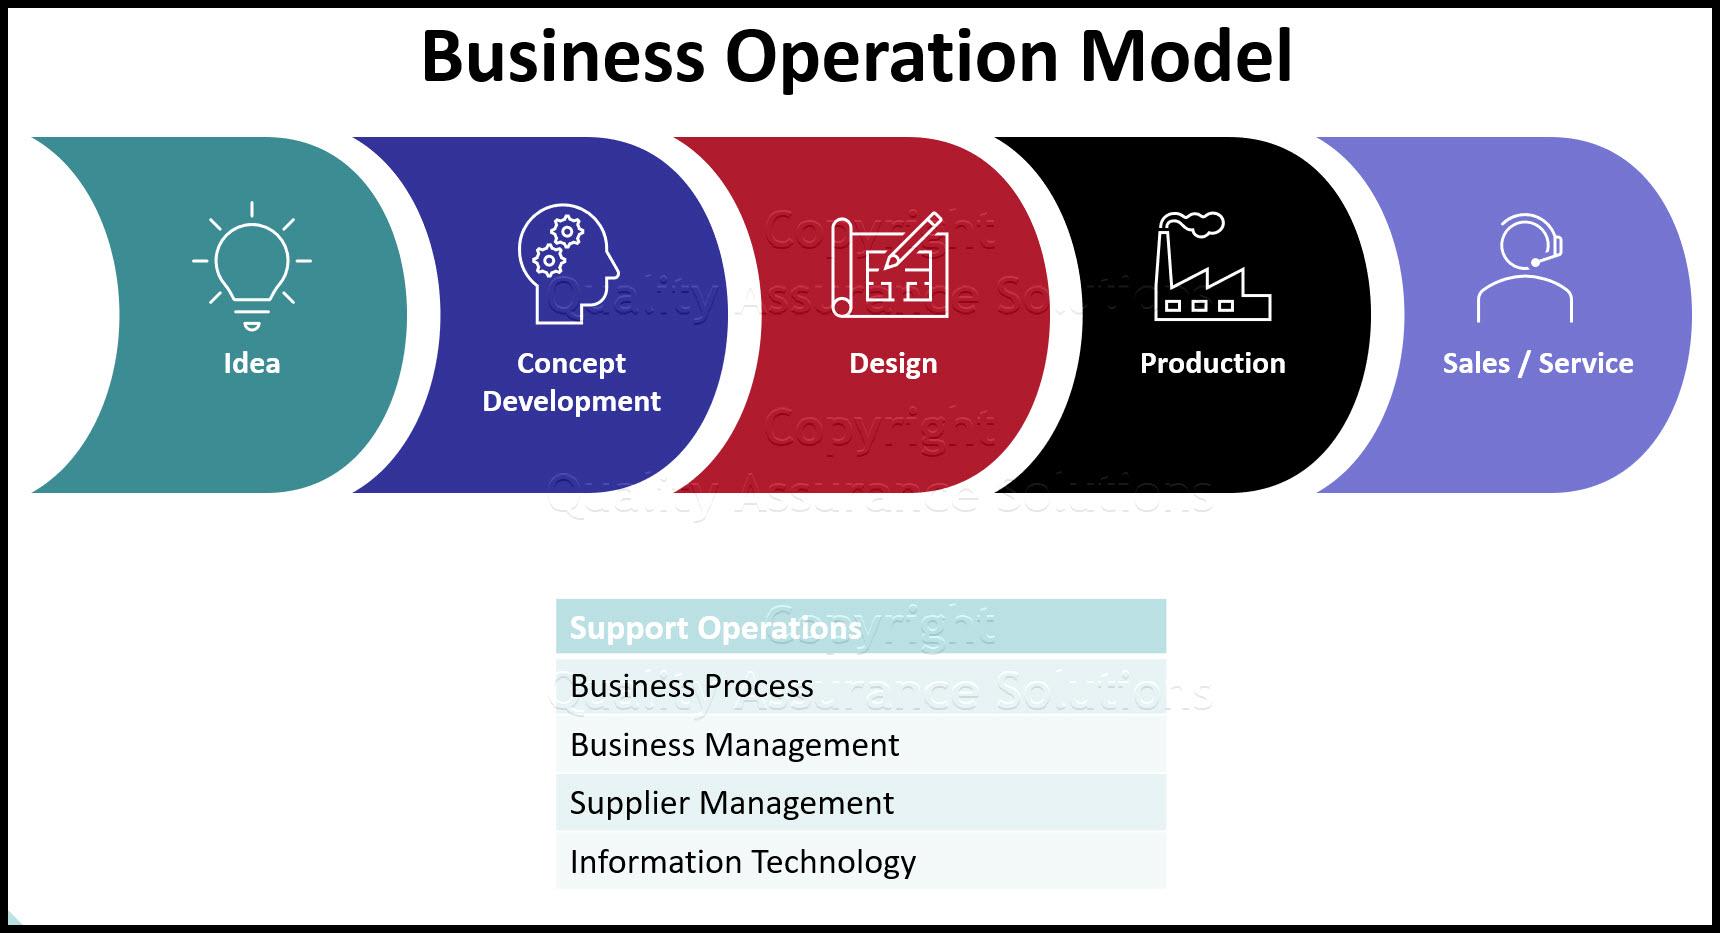 Business Operation Model slide